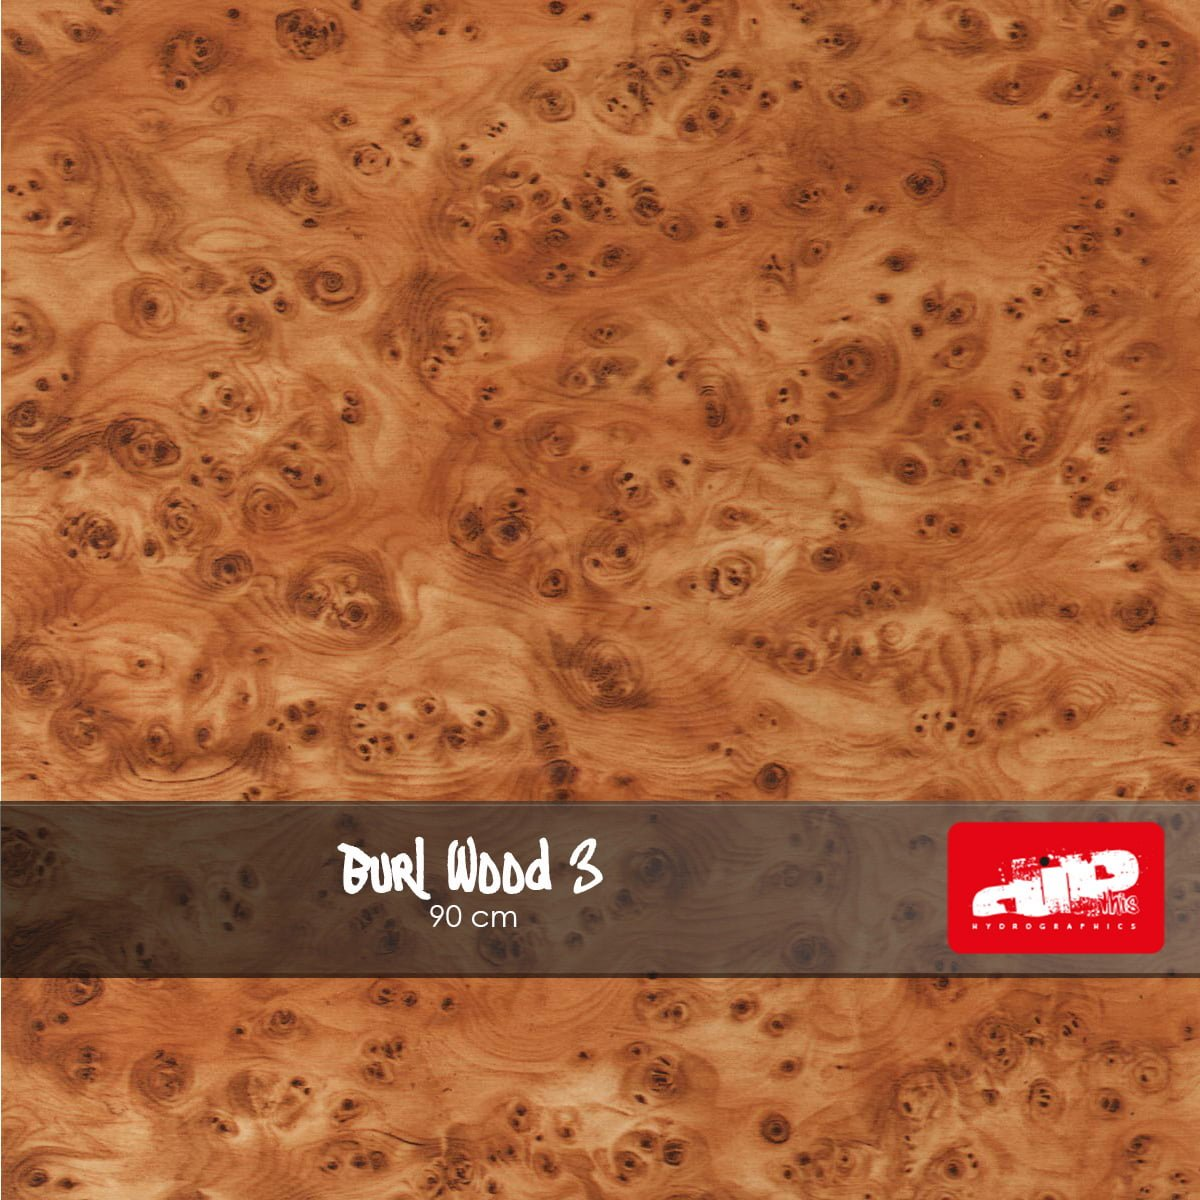 Burl Wood 3